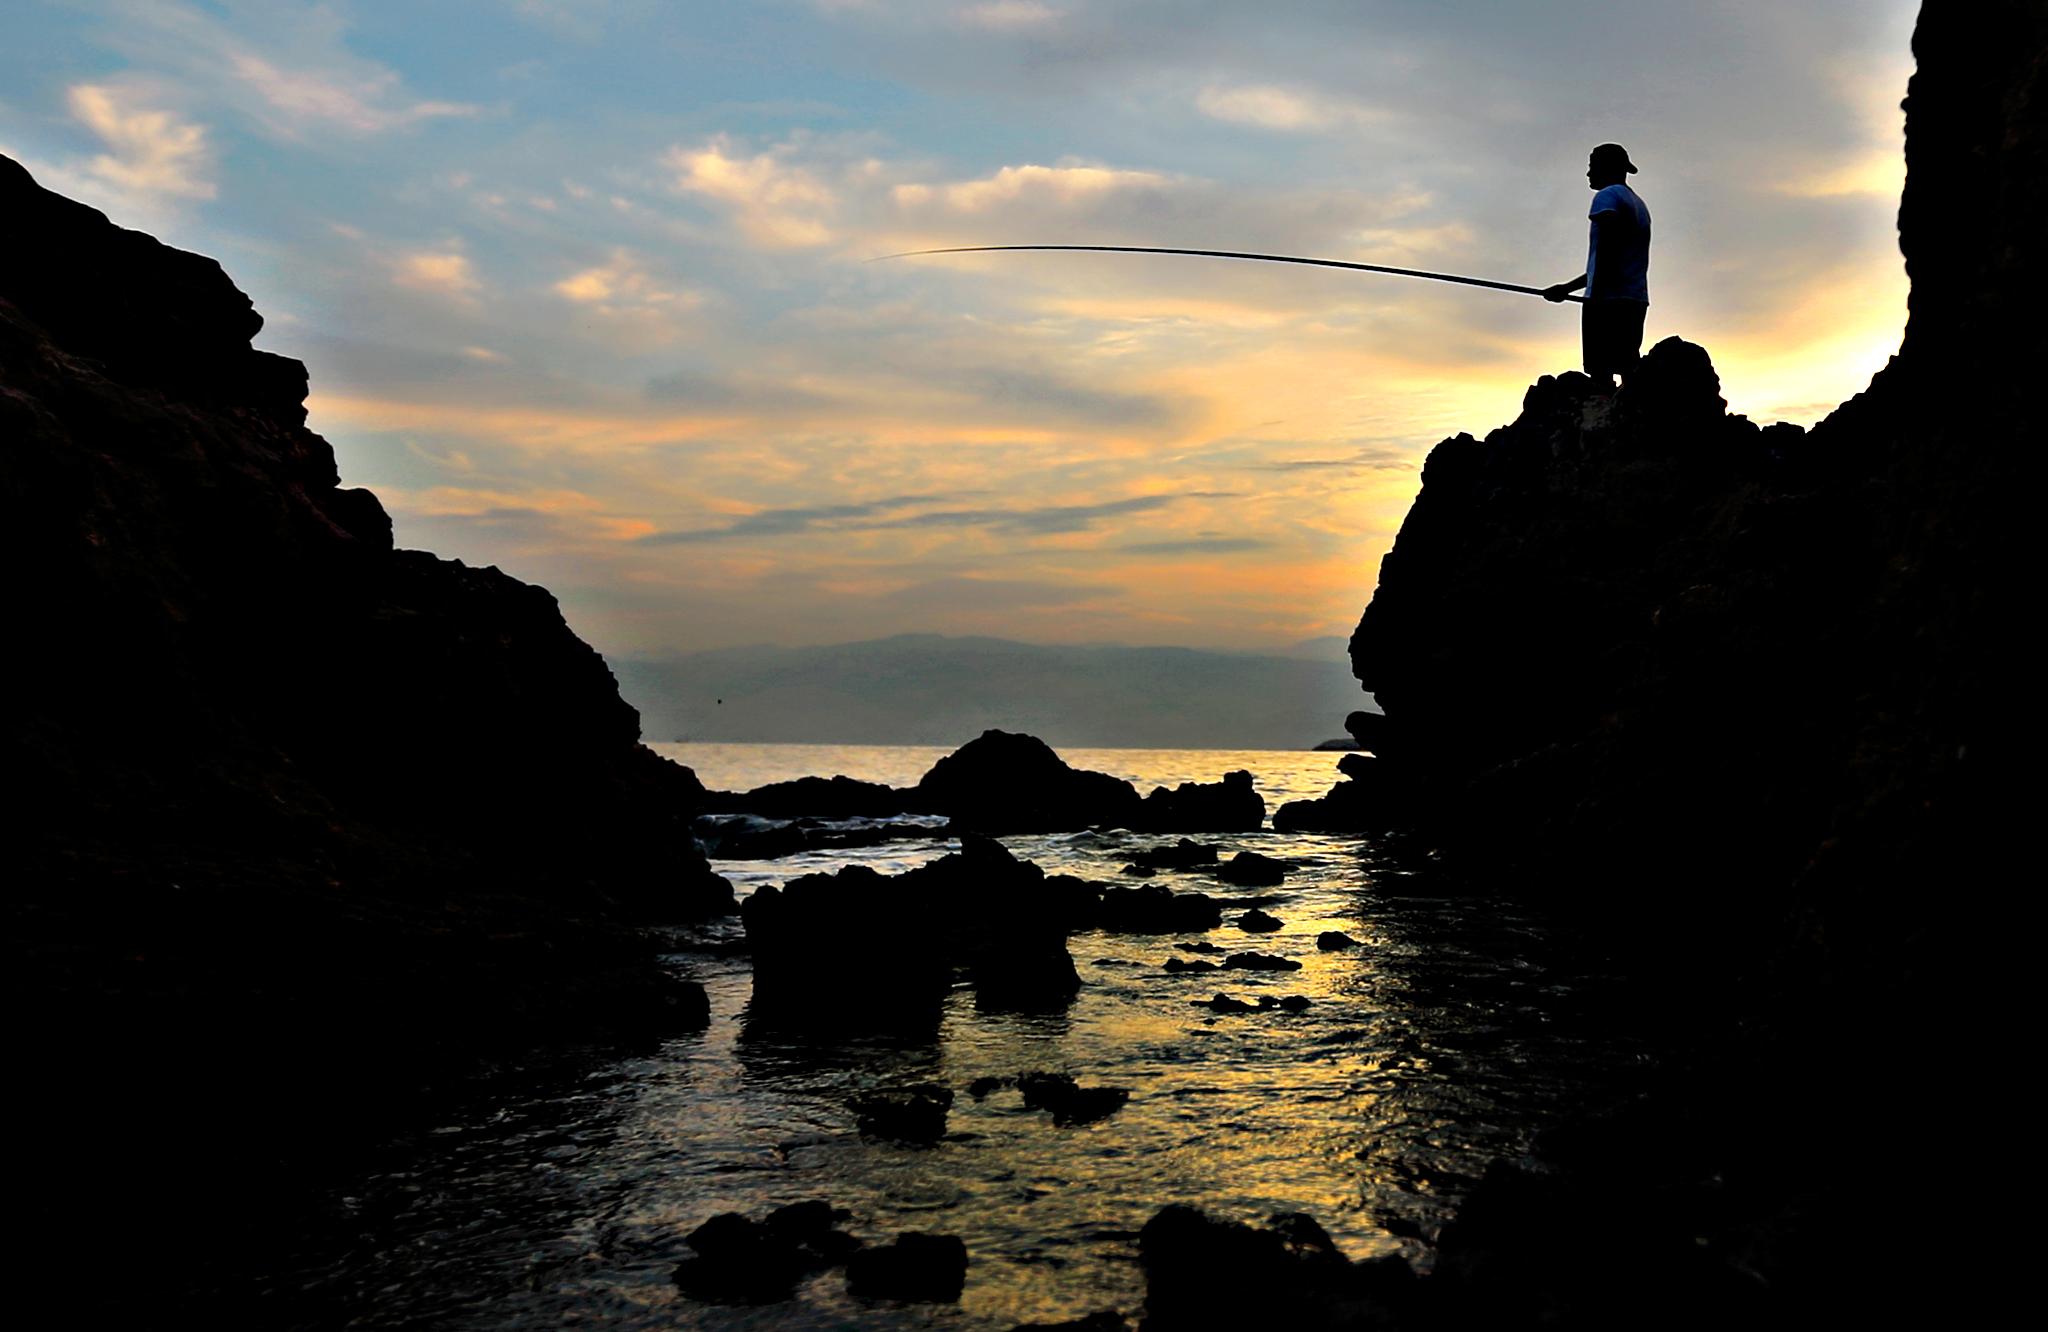 A Lebanese angler casts his fishing pole from a rocky coastal area along the Beirut coastline as the sun rises over the Mediterranean Sea, Lebanon, Tuesday, Oct. 6, 2015